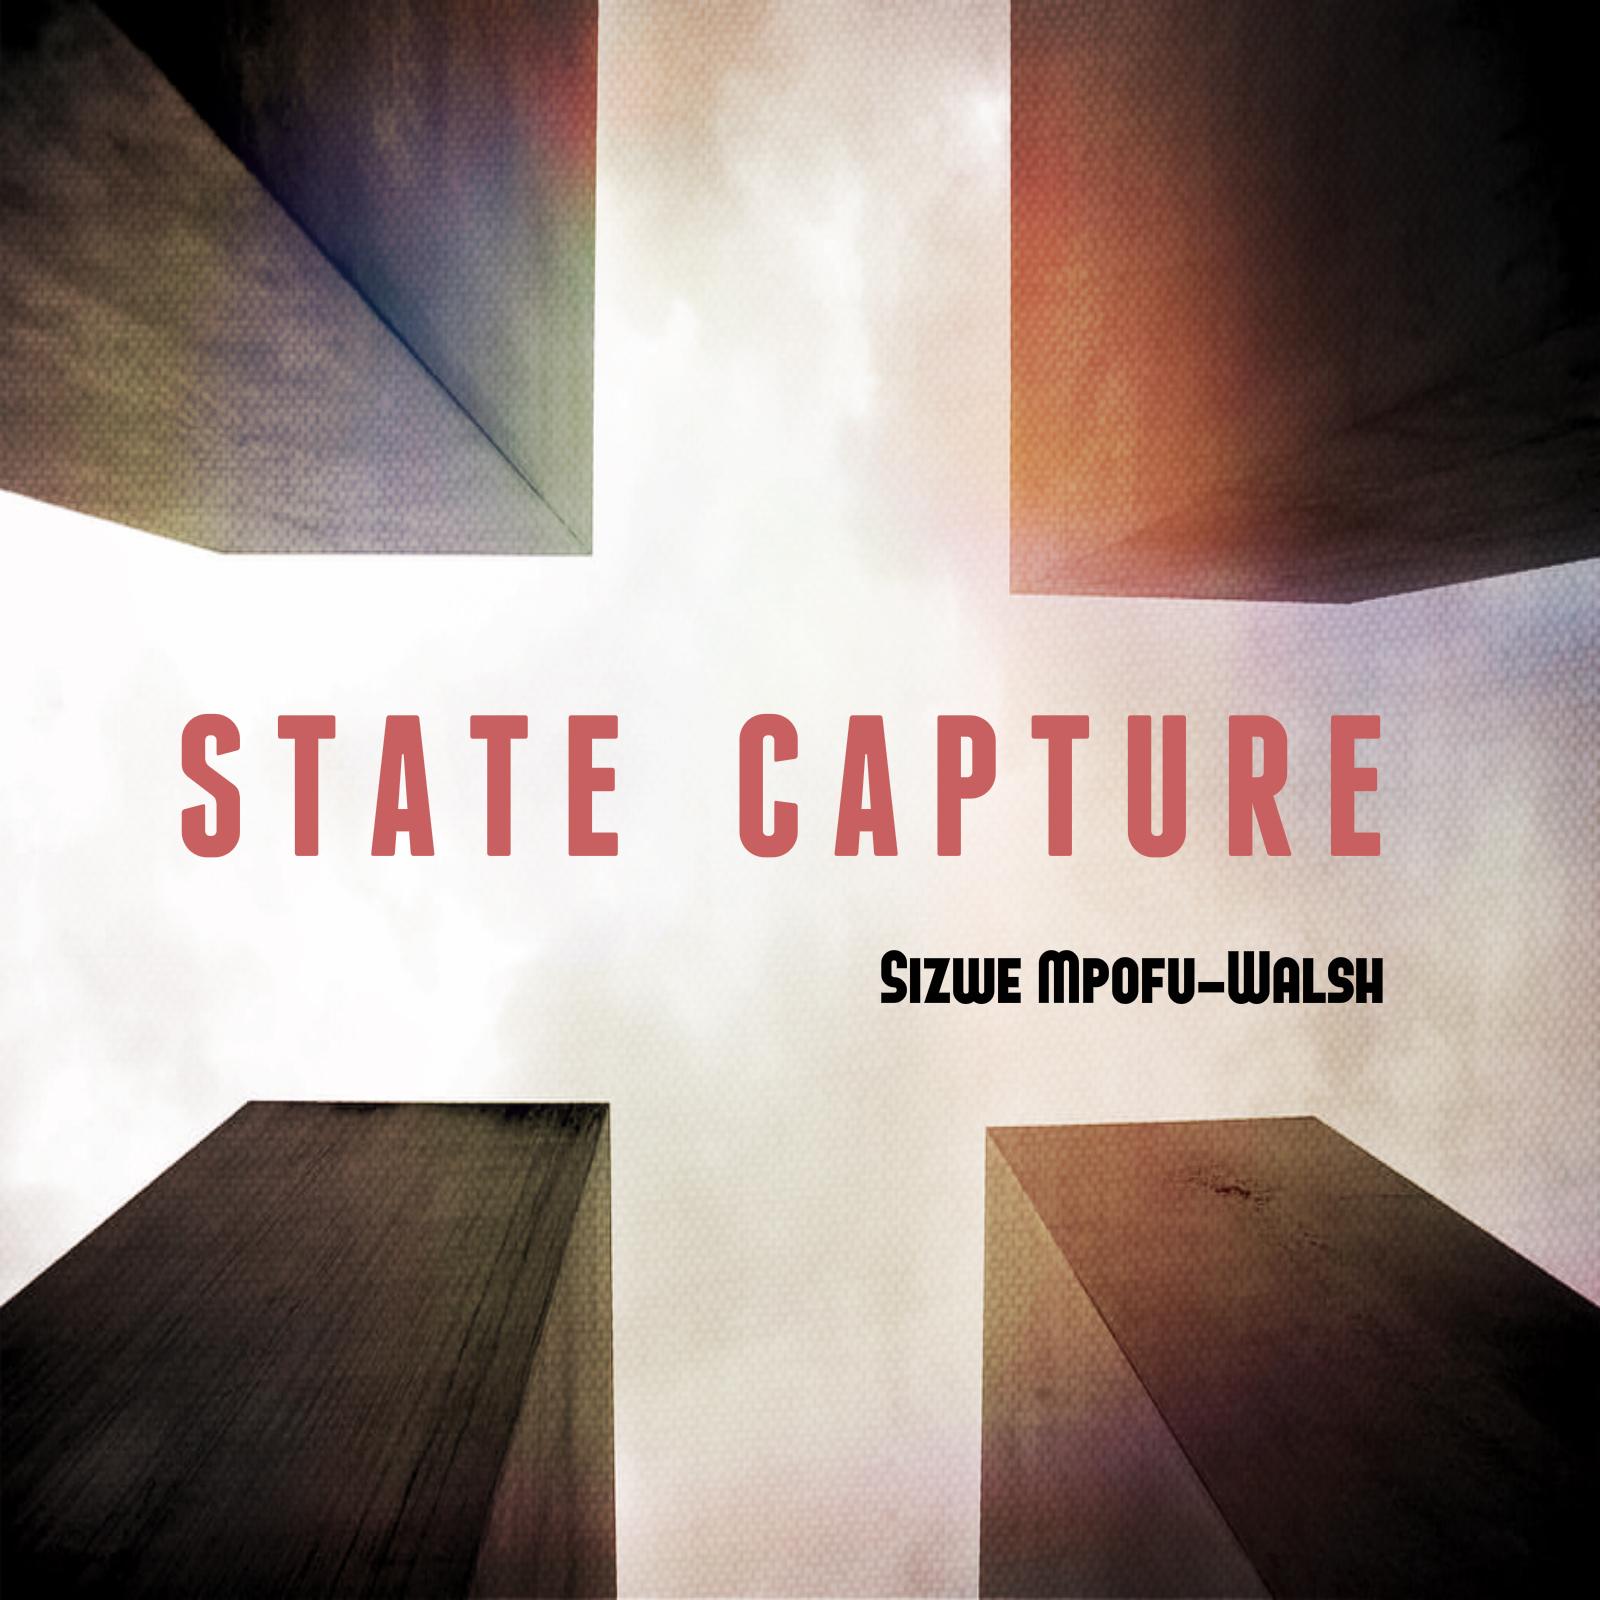 statecapturesong